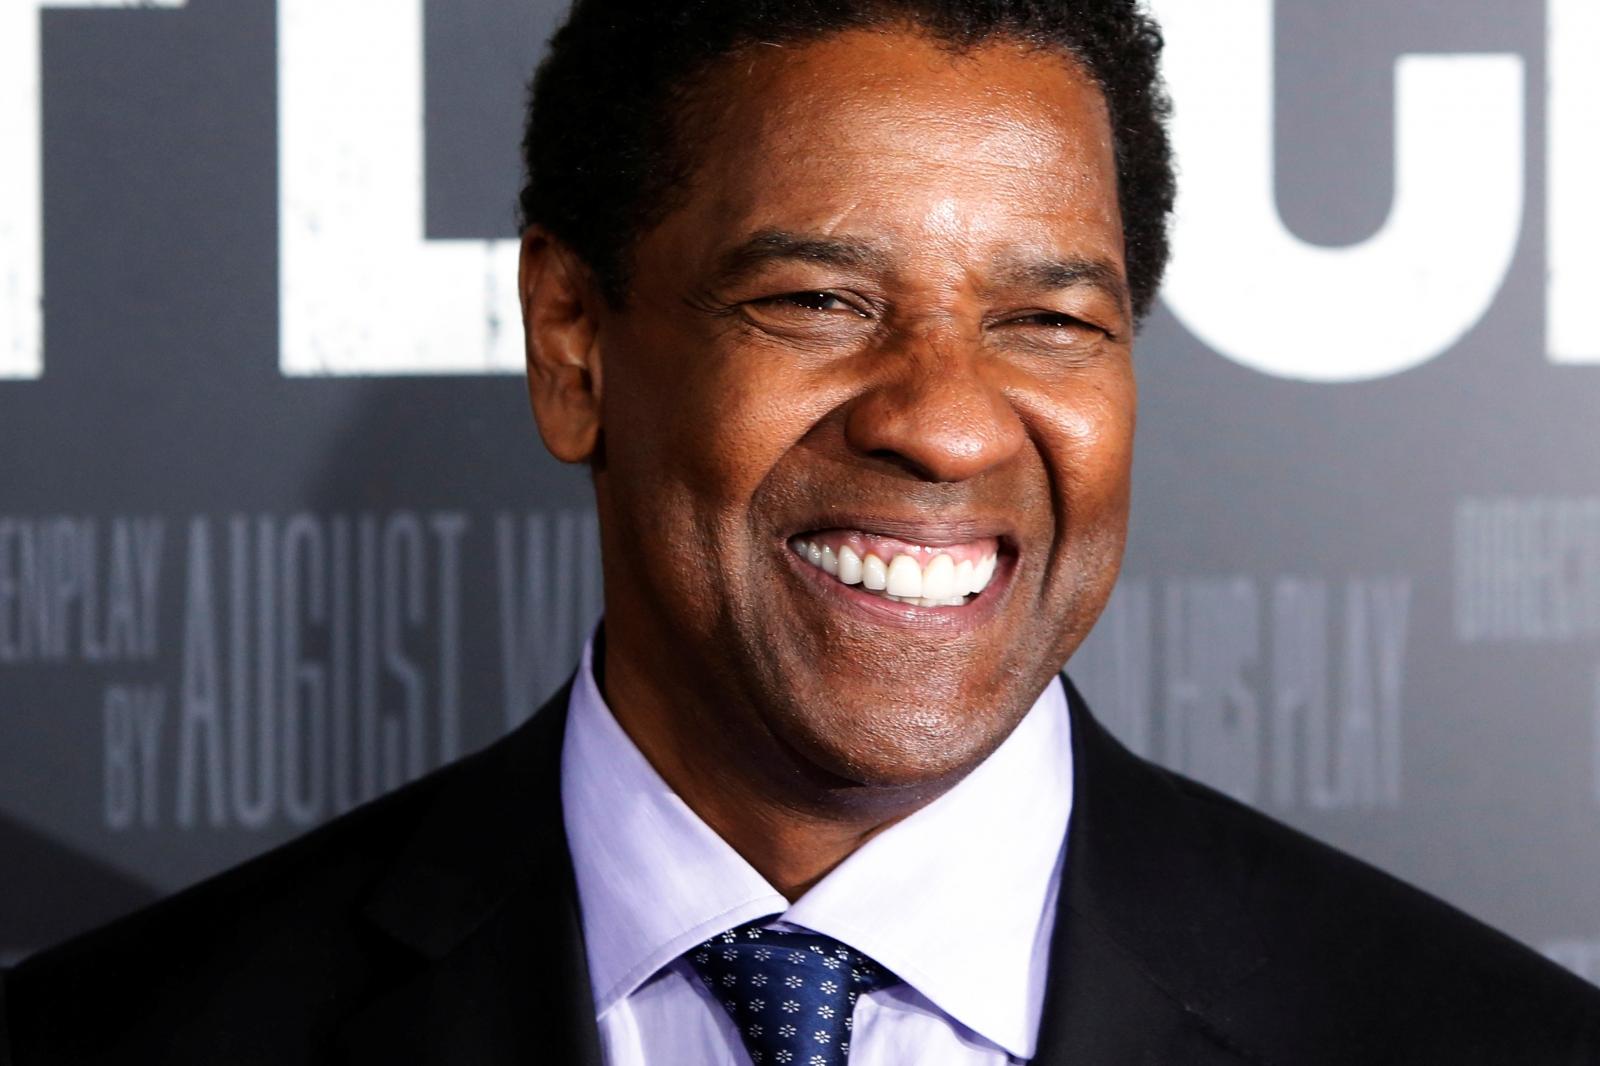 Chadwick Boseman talks about Denzel Washington joining the MCU amid Magneto role rumour - International Business Times UK